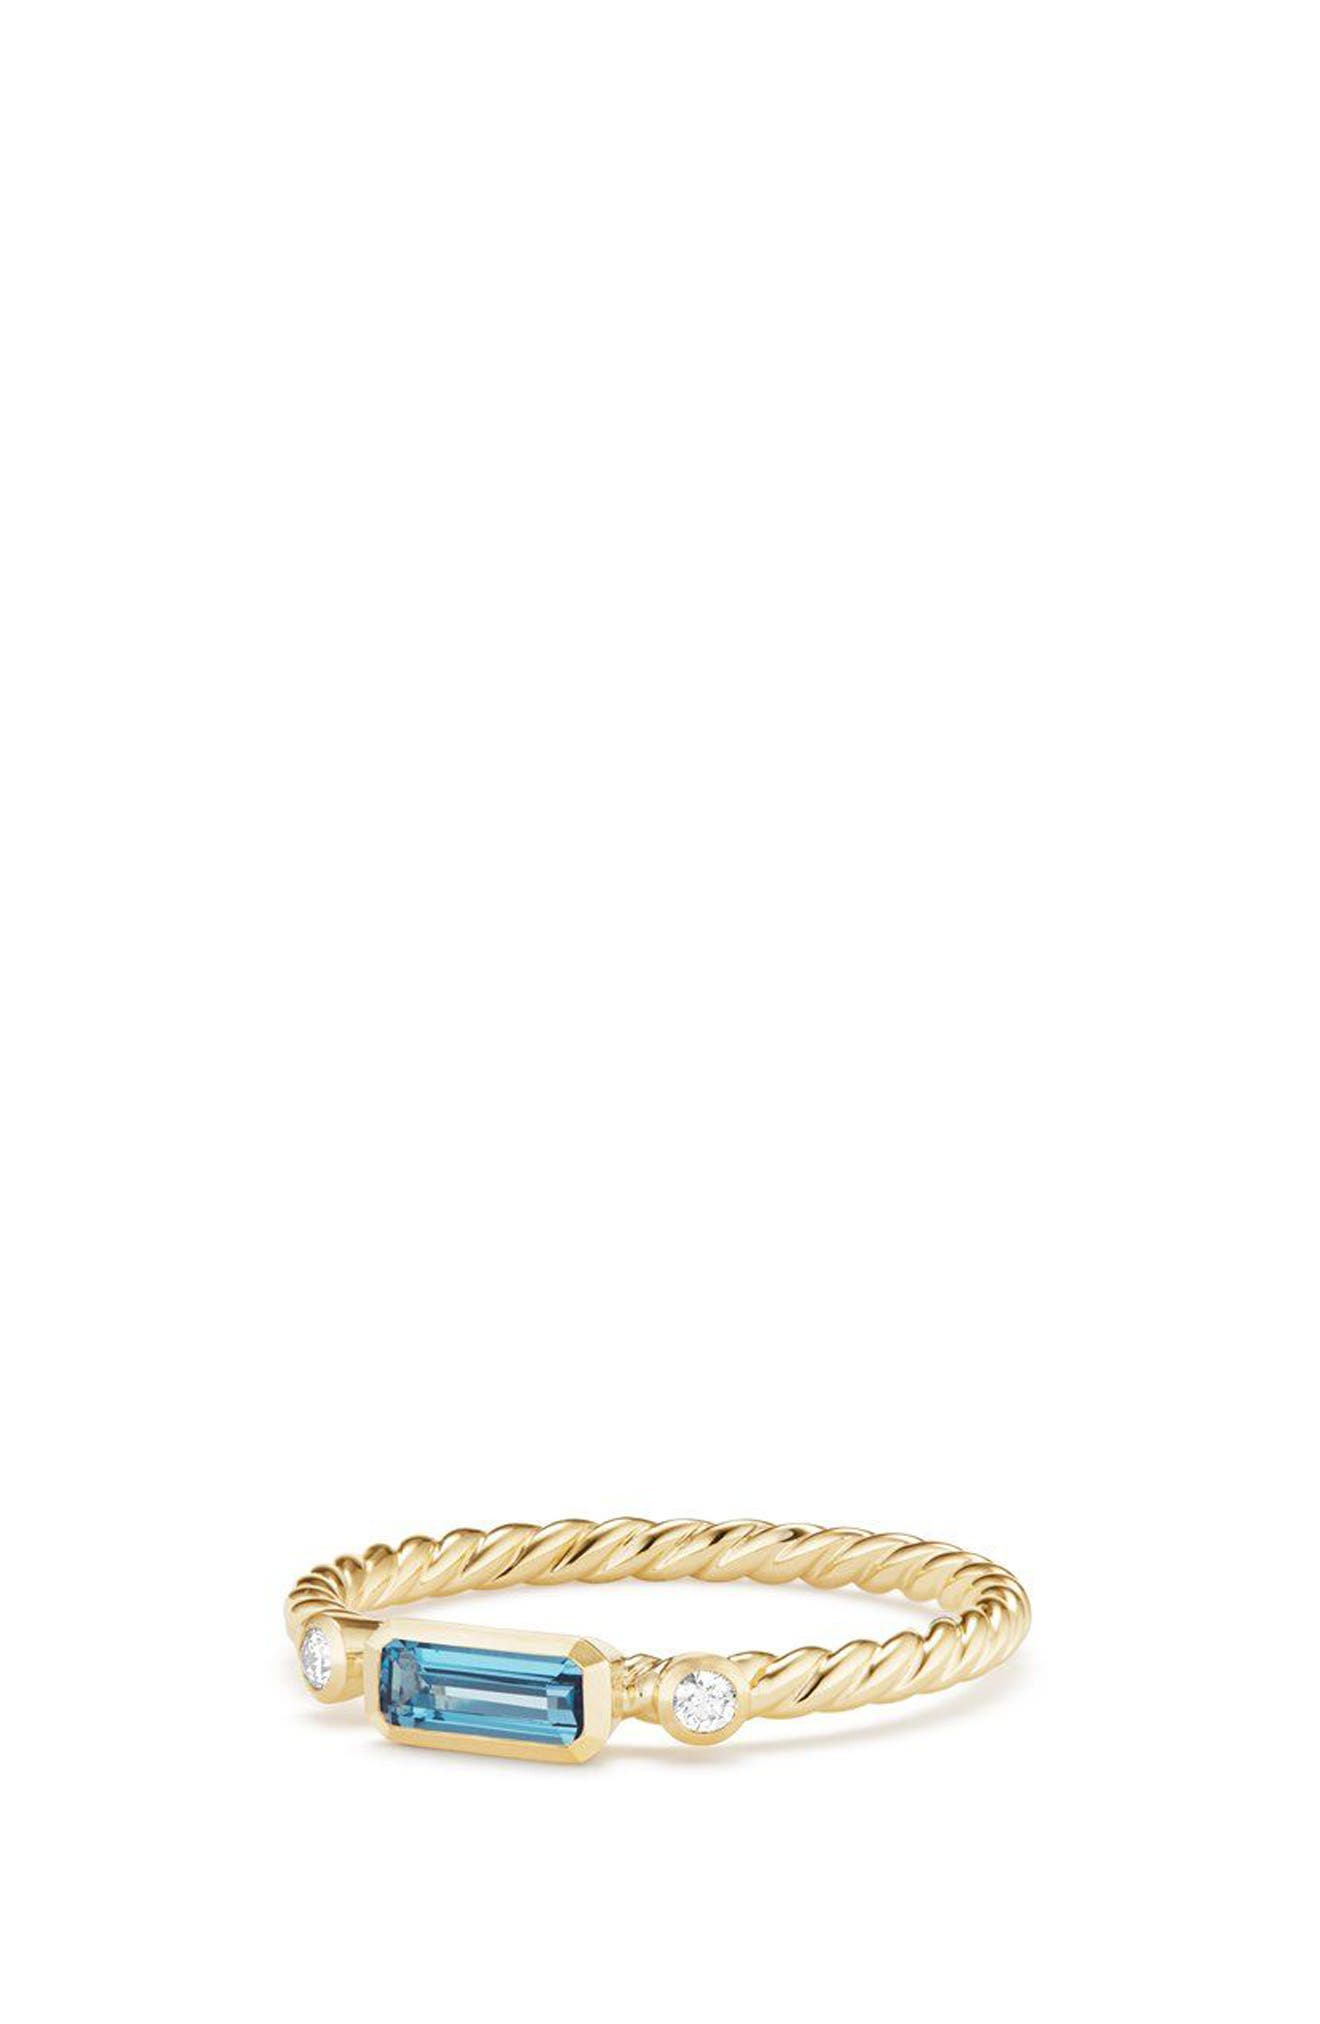 DAVID YURMAN Novella Ring in 18K Gold, Main, color, GOLD/ DIAMOND/ BLUE TOPAZ